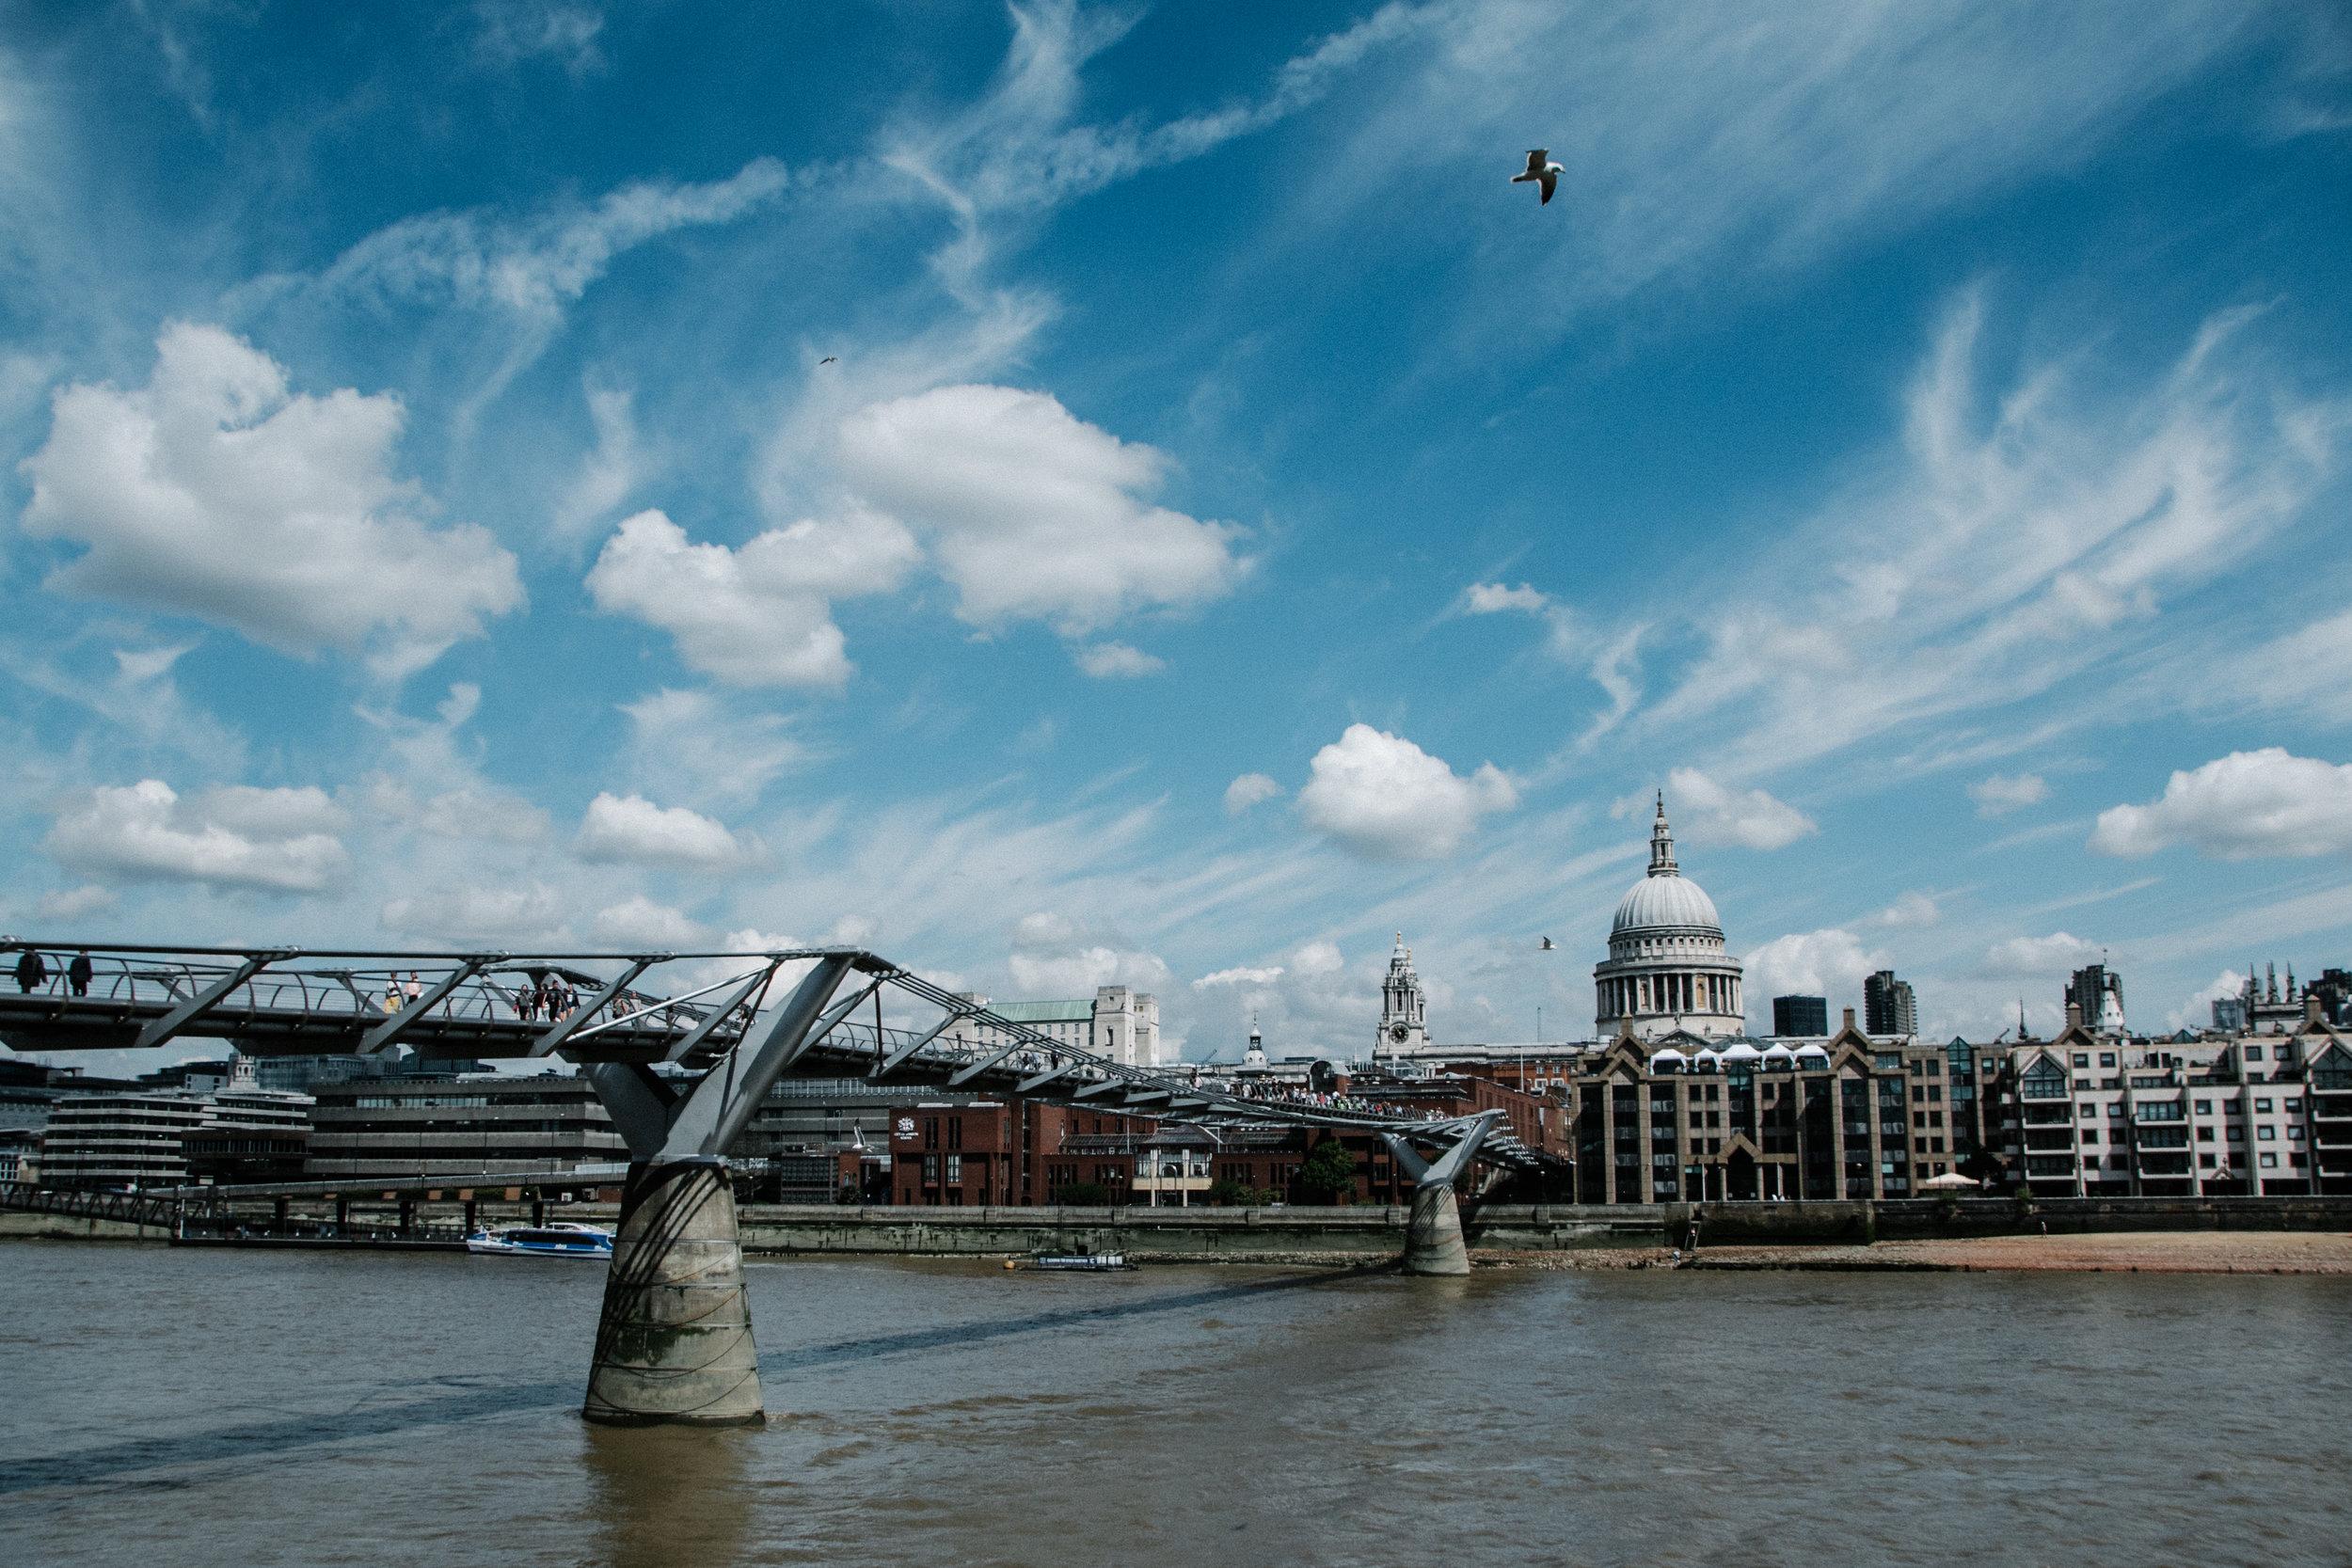 thames-river-london_48364860522_o.jpg